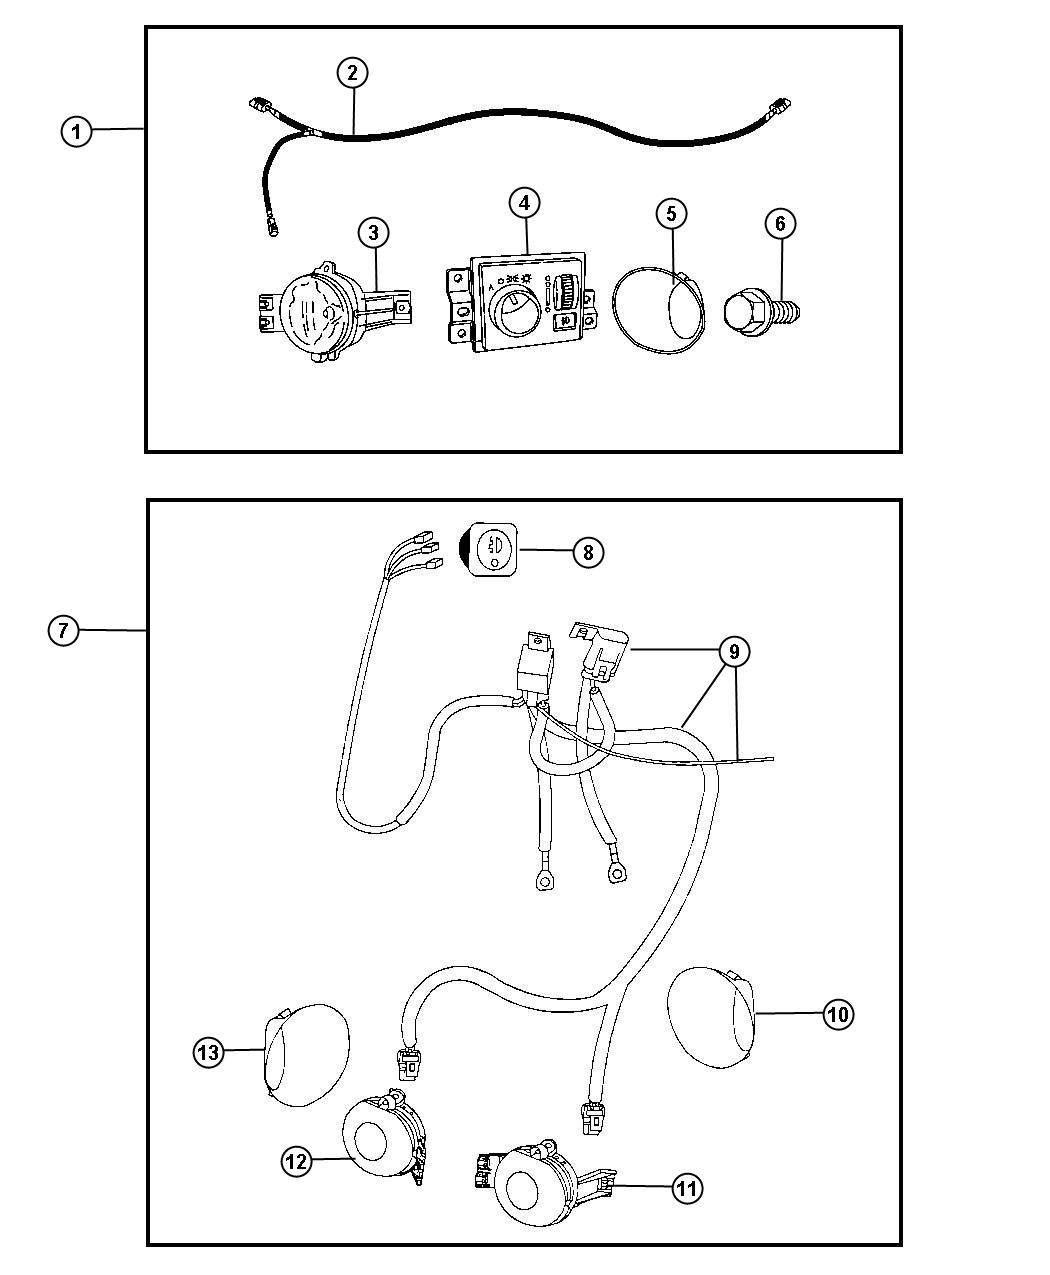 Dodge Ram 1500 Fog Lights, Complete Kit, includes switch